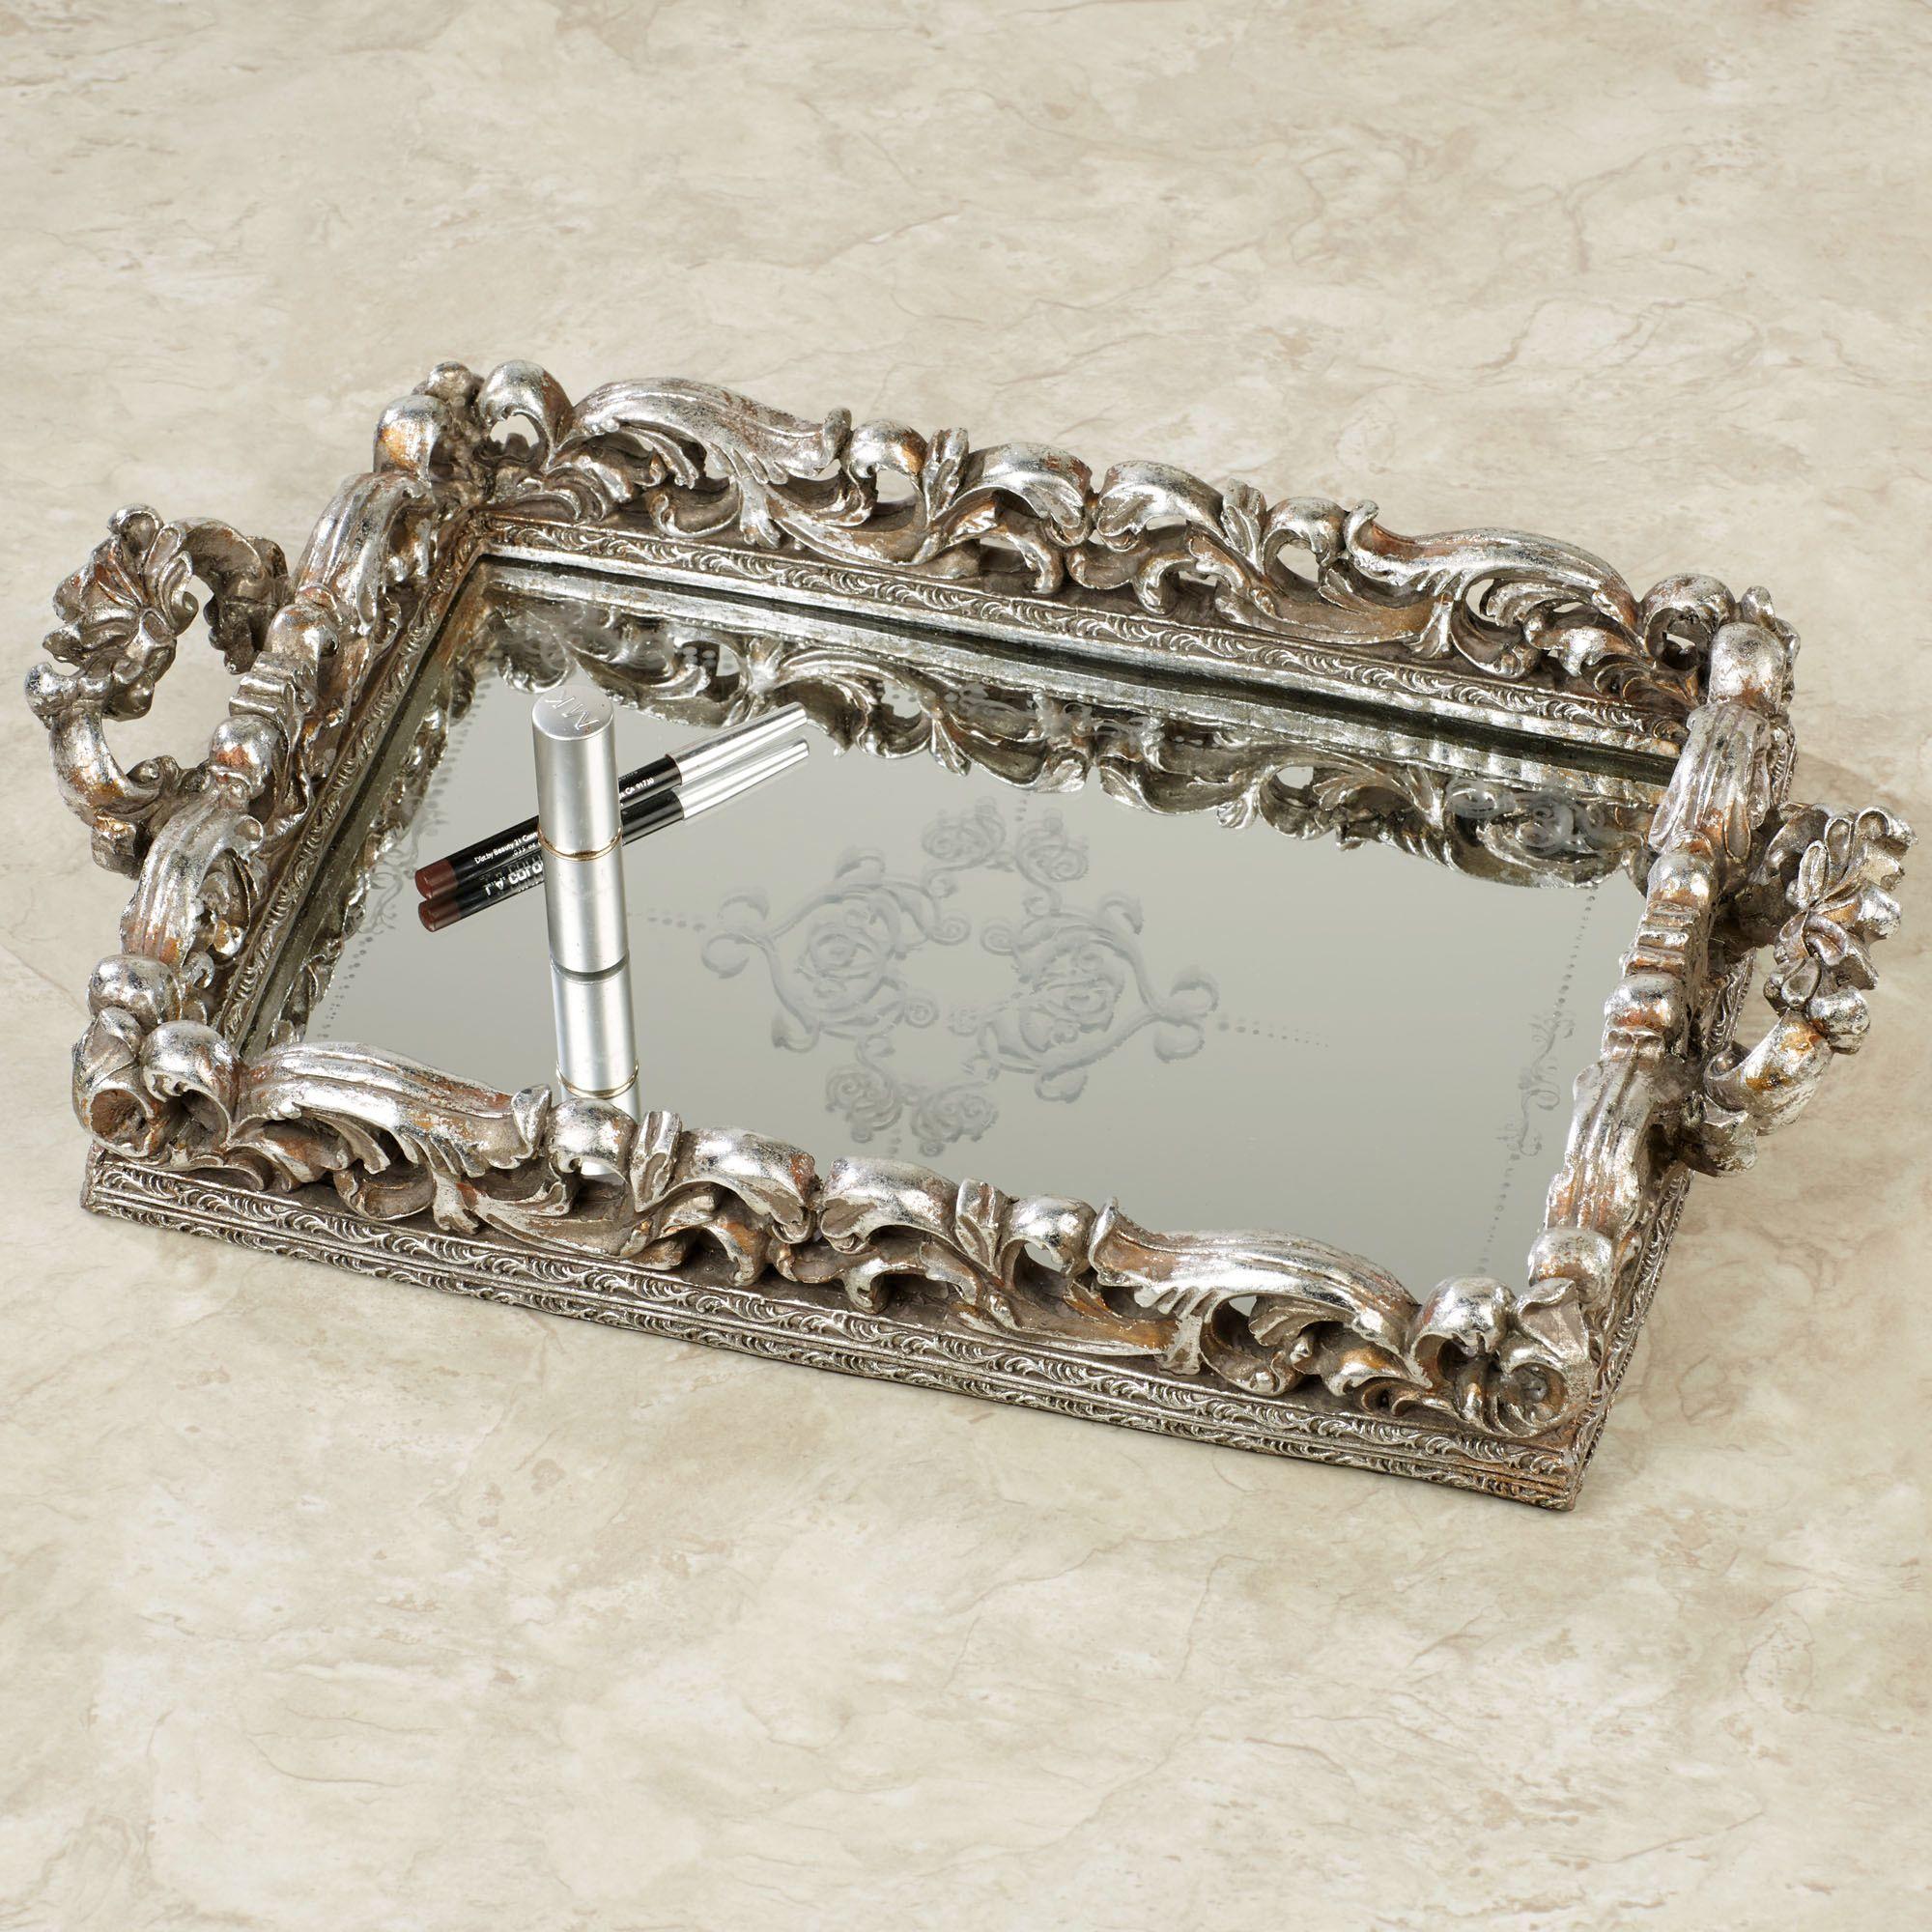 White vanity mirror vintage mirror vanity tray vintage mirrored - Elaine Antique Silver Mirrored Vanity Tray